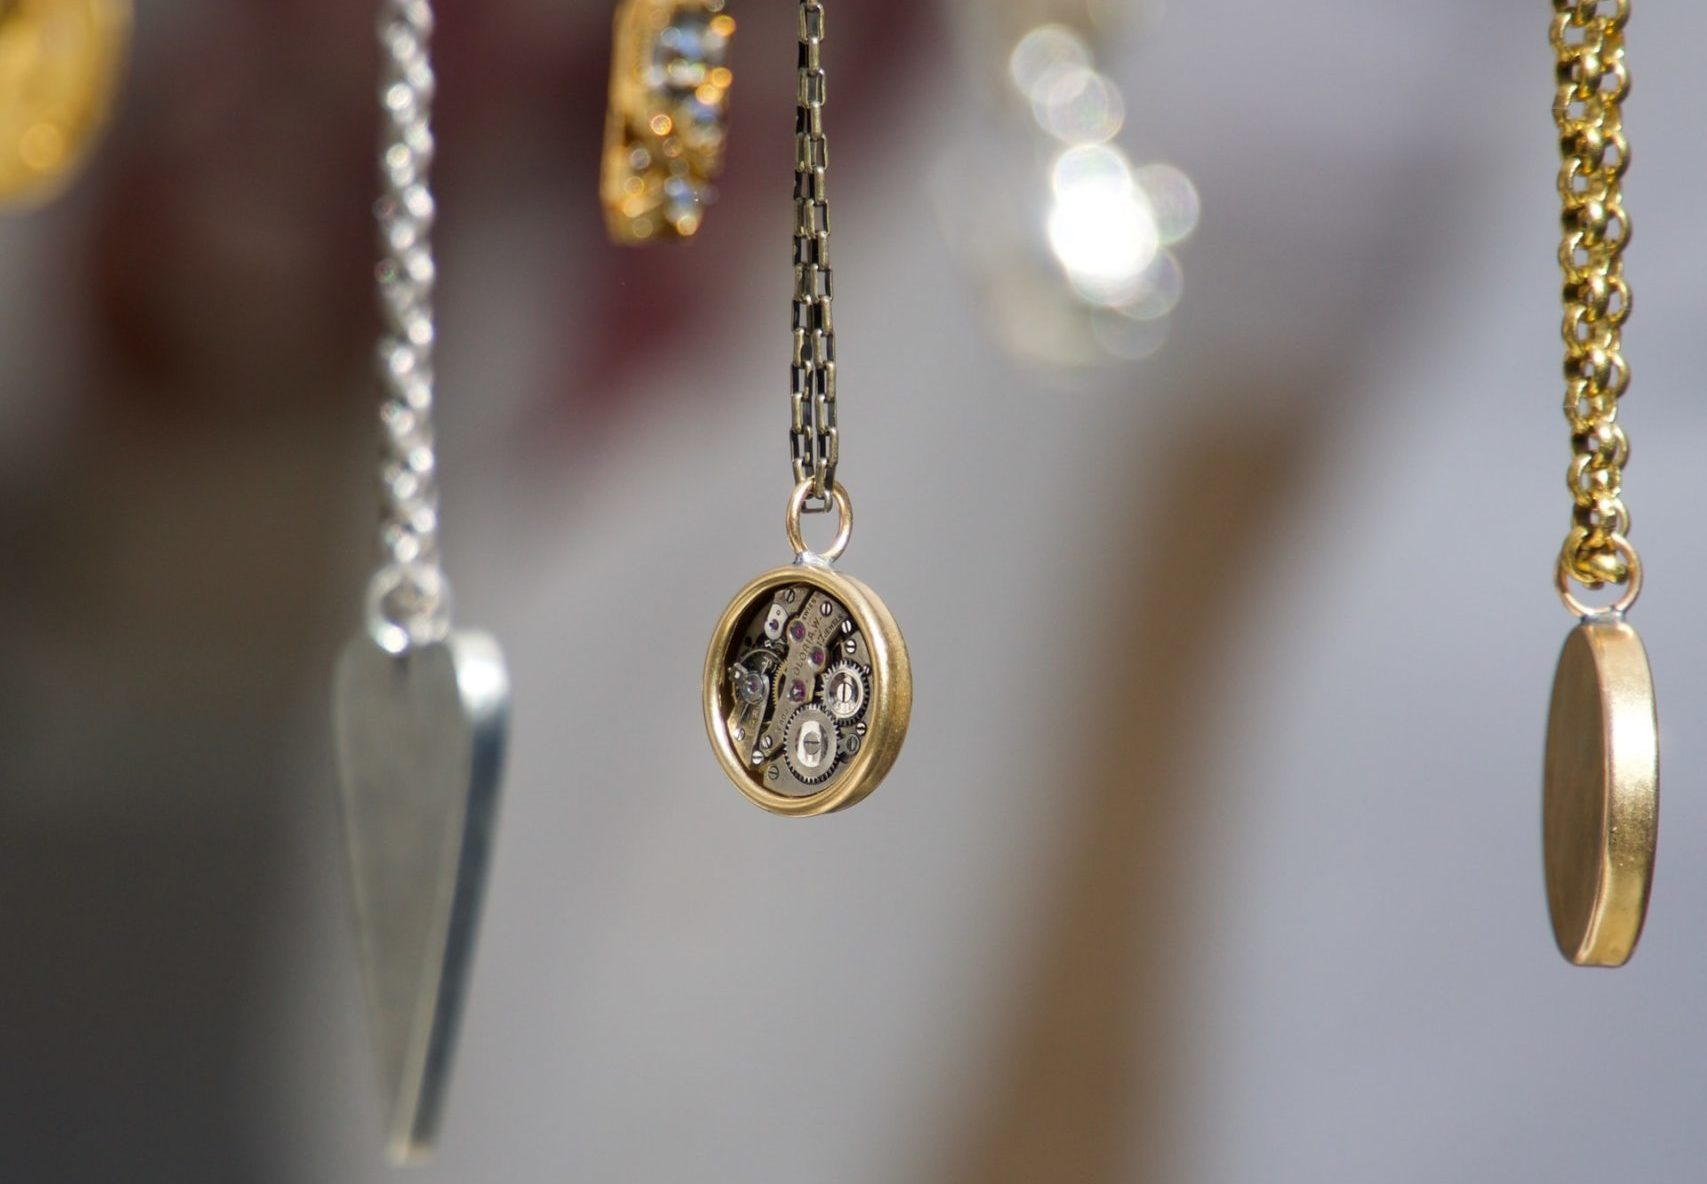 French jewelry